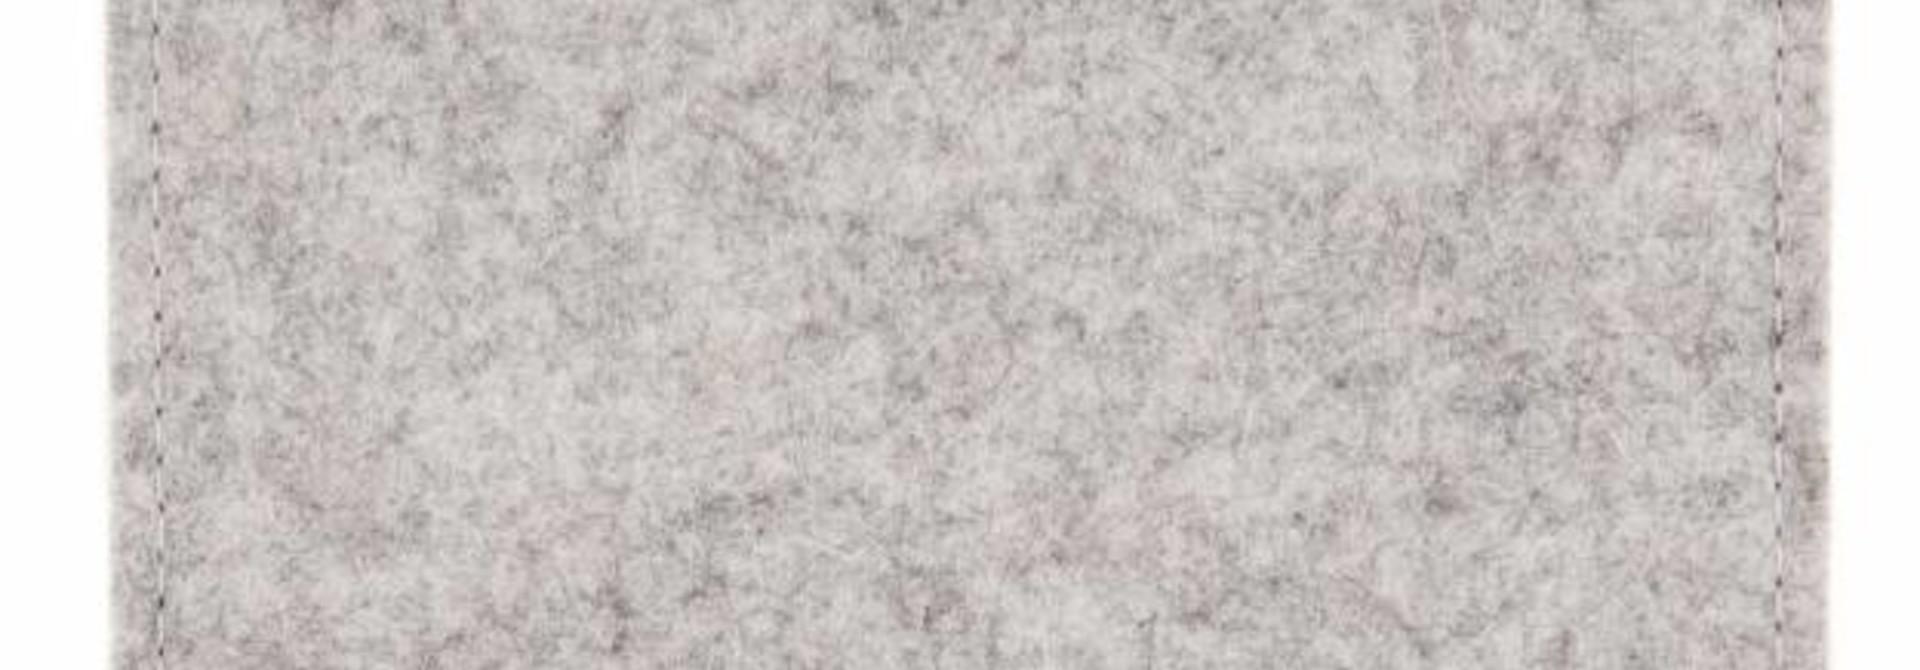 Tablet Sleeve Light-Grey